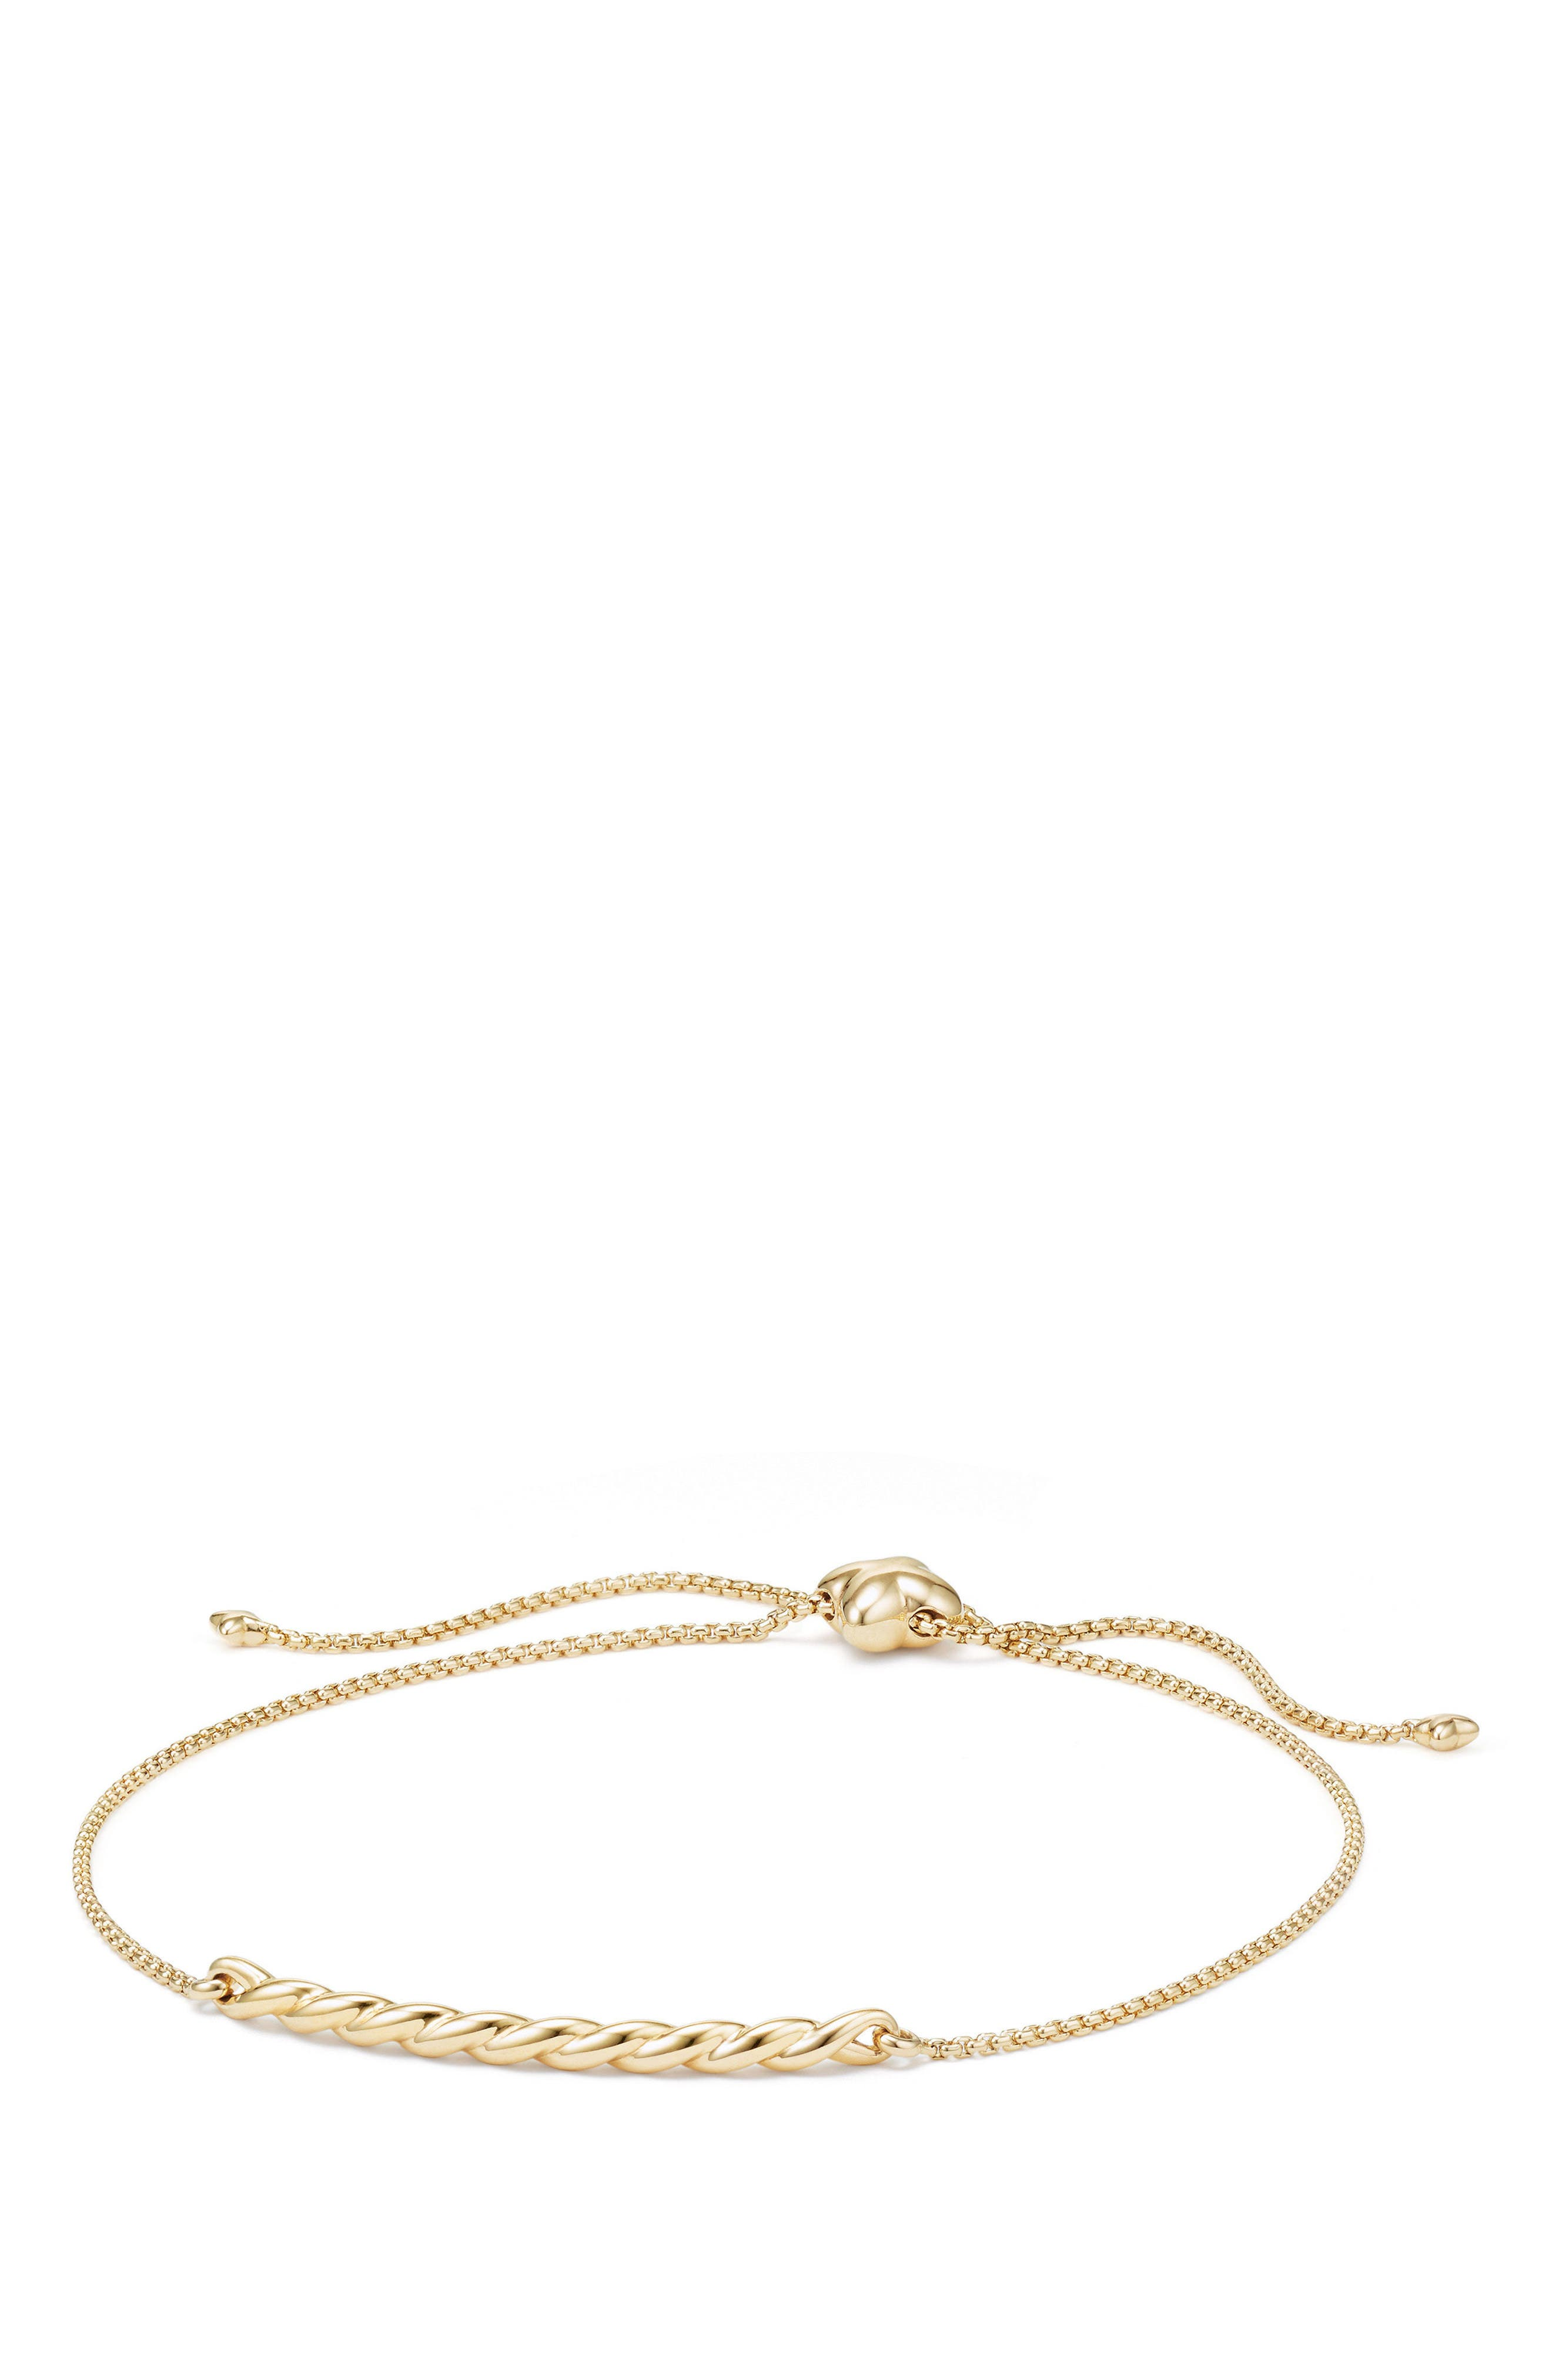 Paveflex Station Bracelet in 18K Gold,                         Main,                         color, Yellow Gold